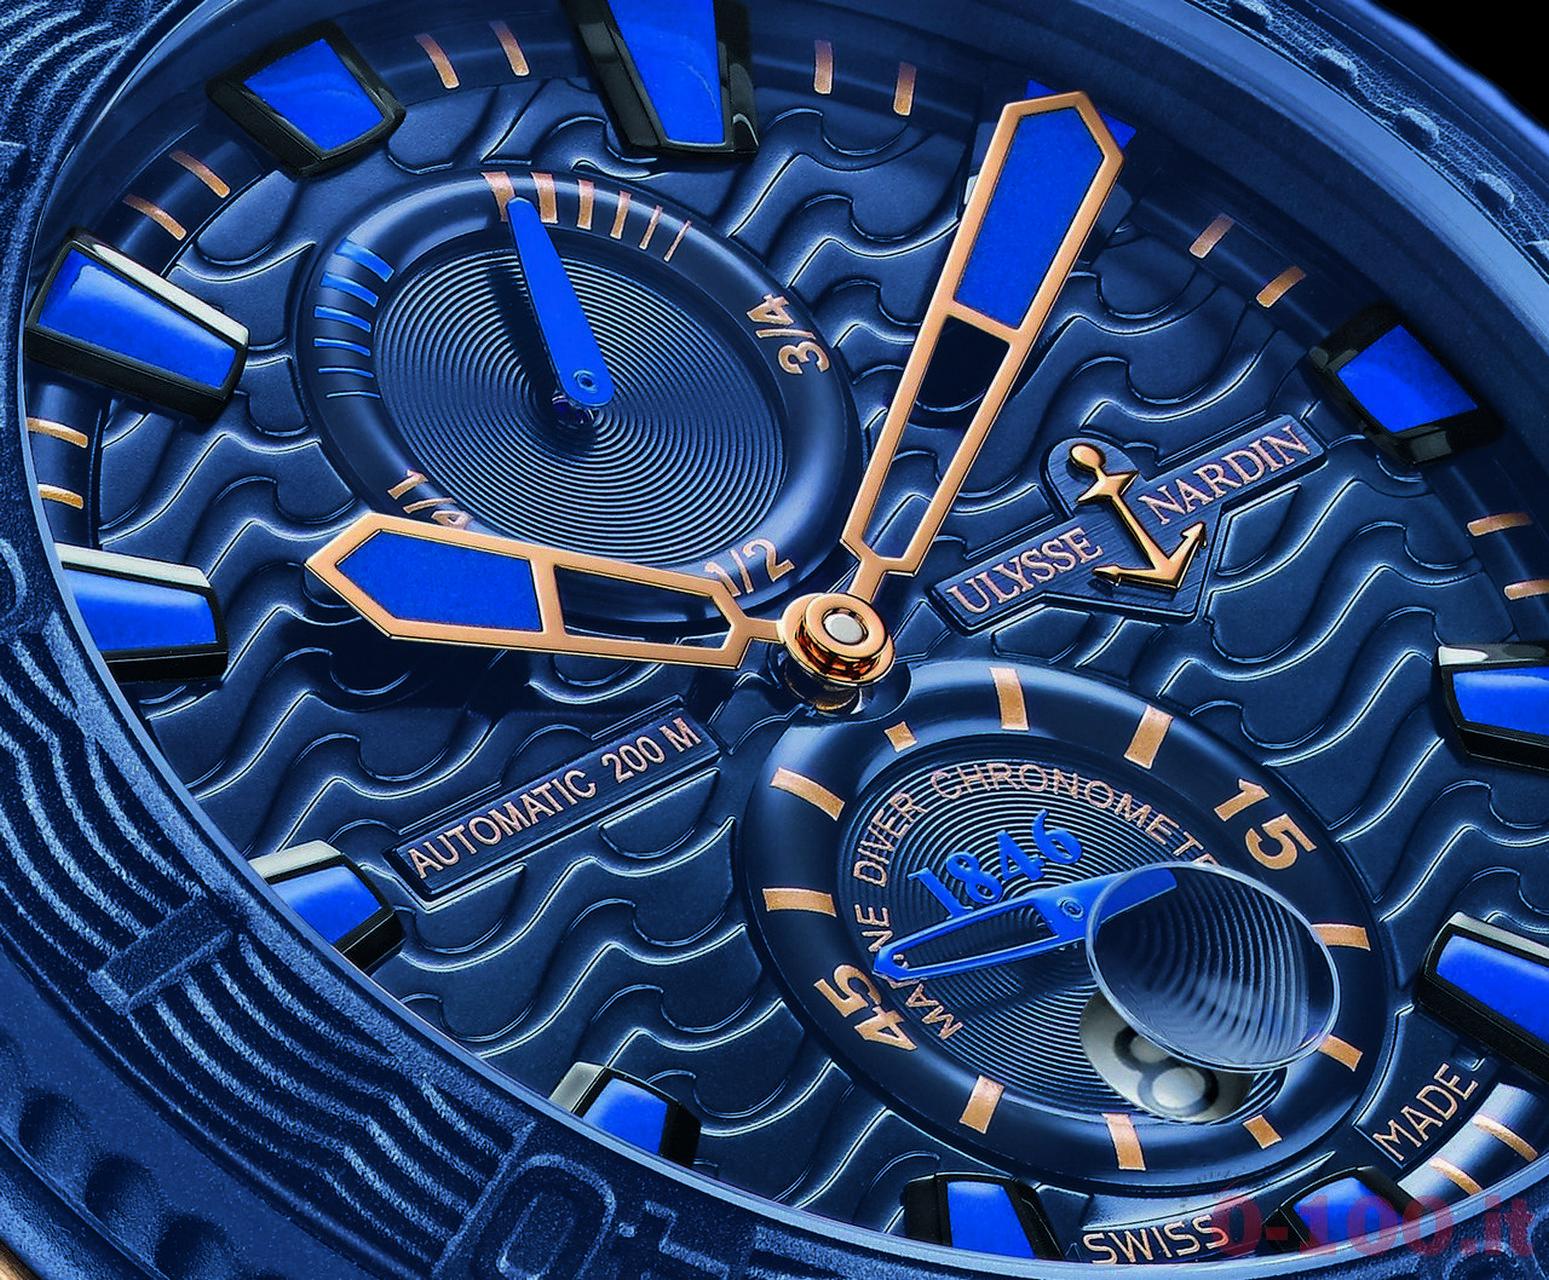 ulysse-nardin-blue-ocean-limited-edition-ref-263-99le-3c-price_0-1003